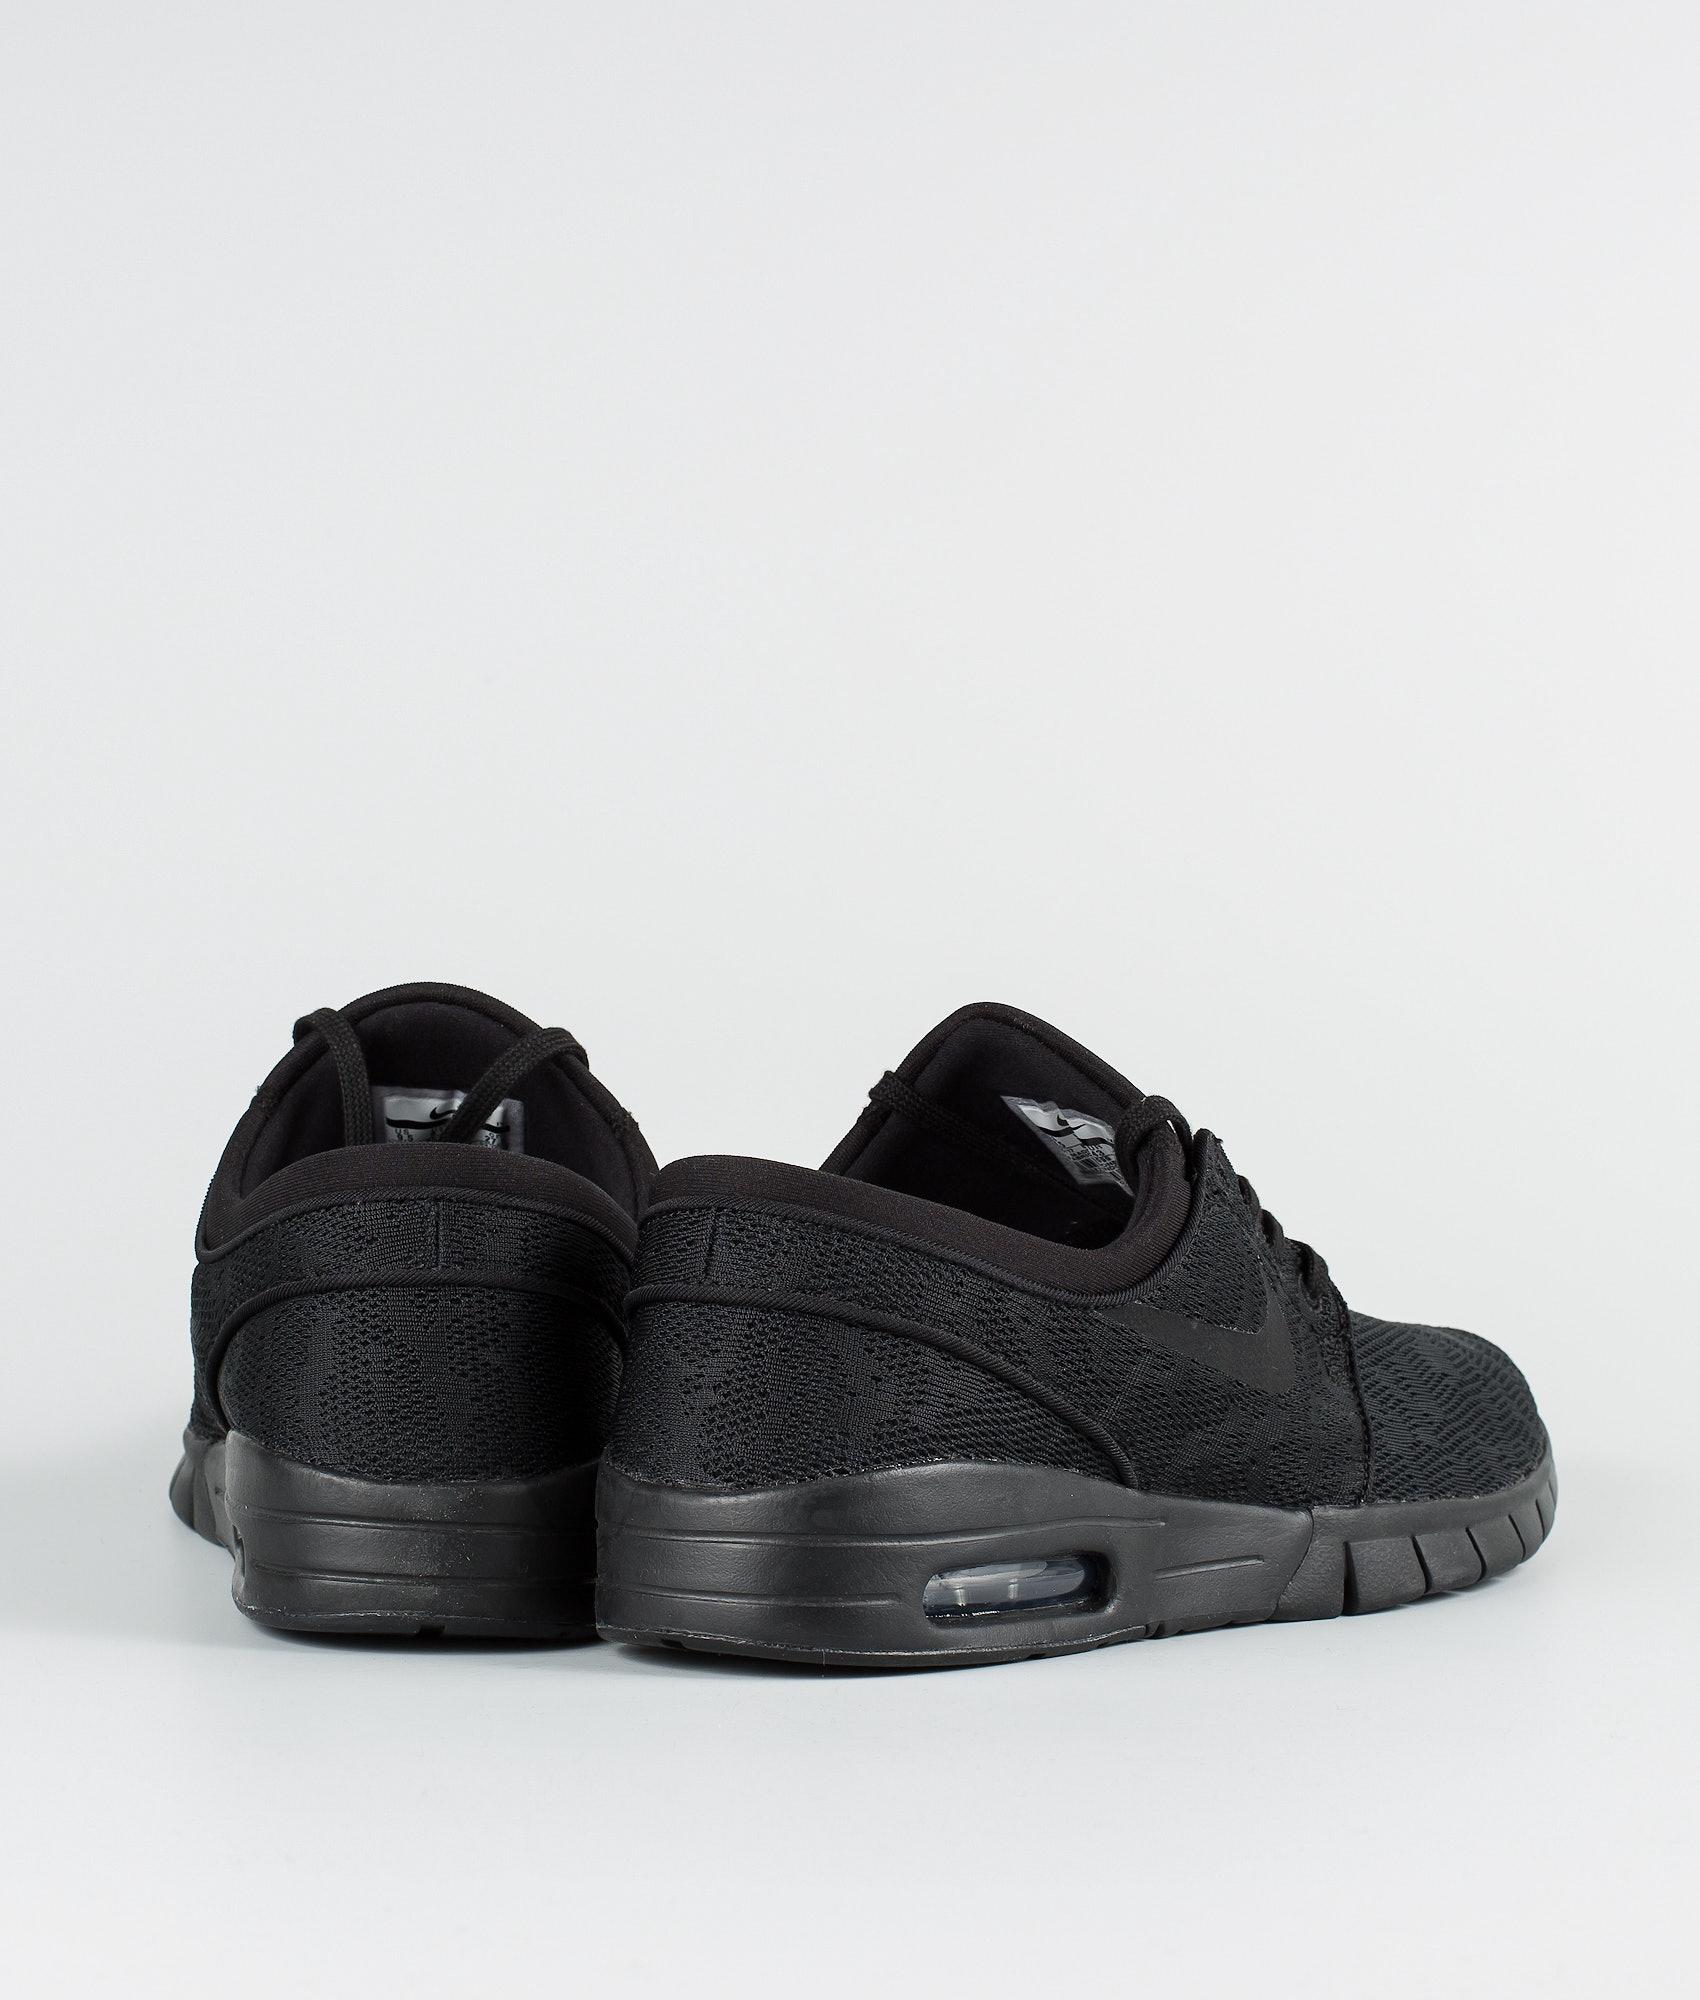 low priced f36bb df53d Nike Stefan Janoski Max Shoes